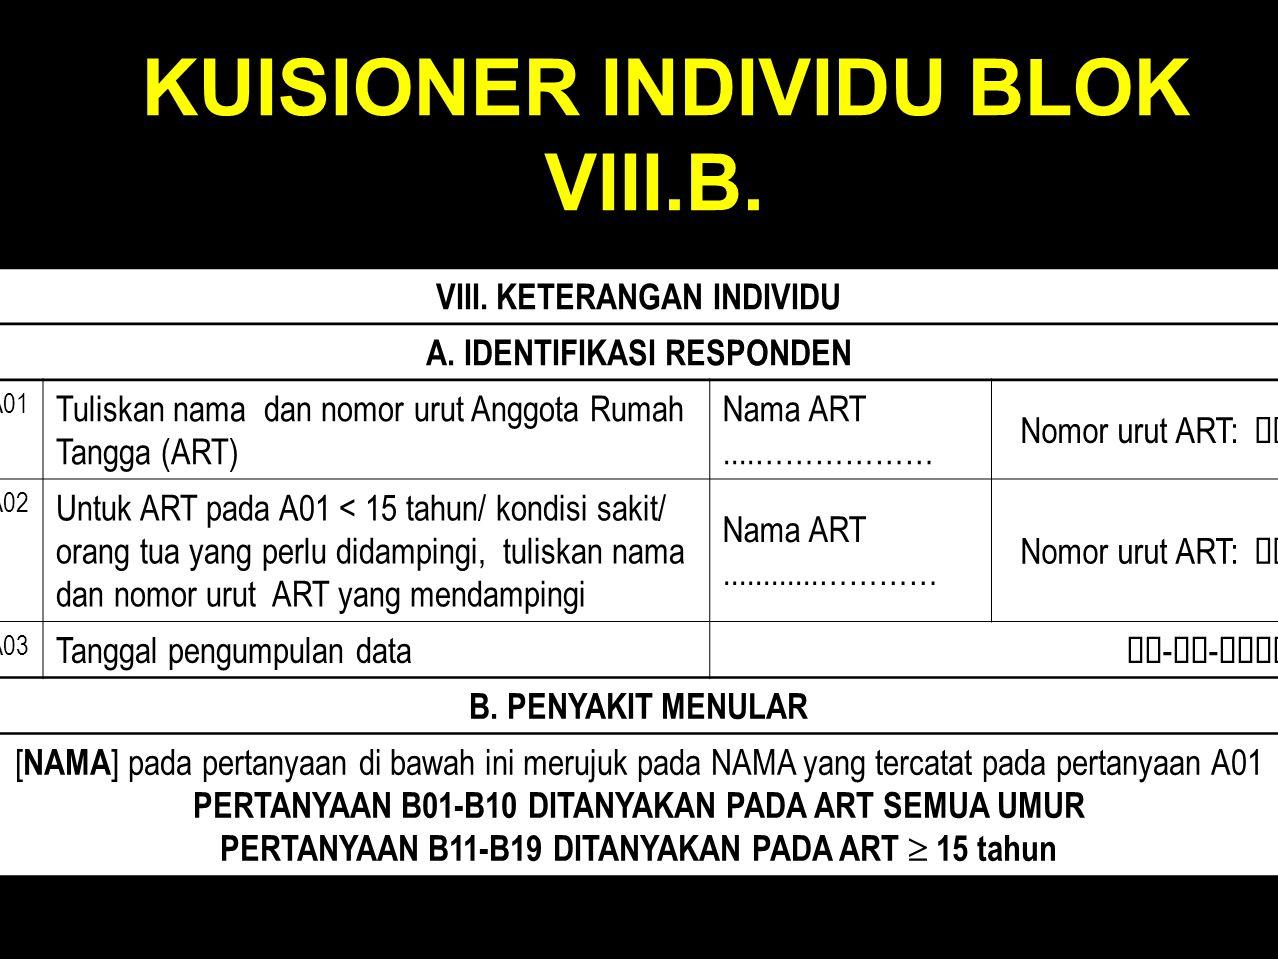 KUISIONER INDIVIDU BLOK VIII.B.